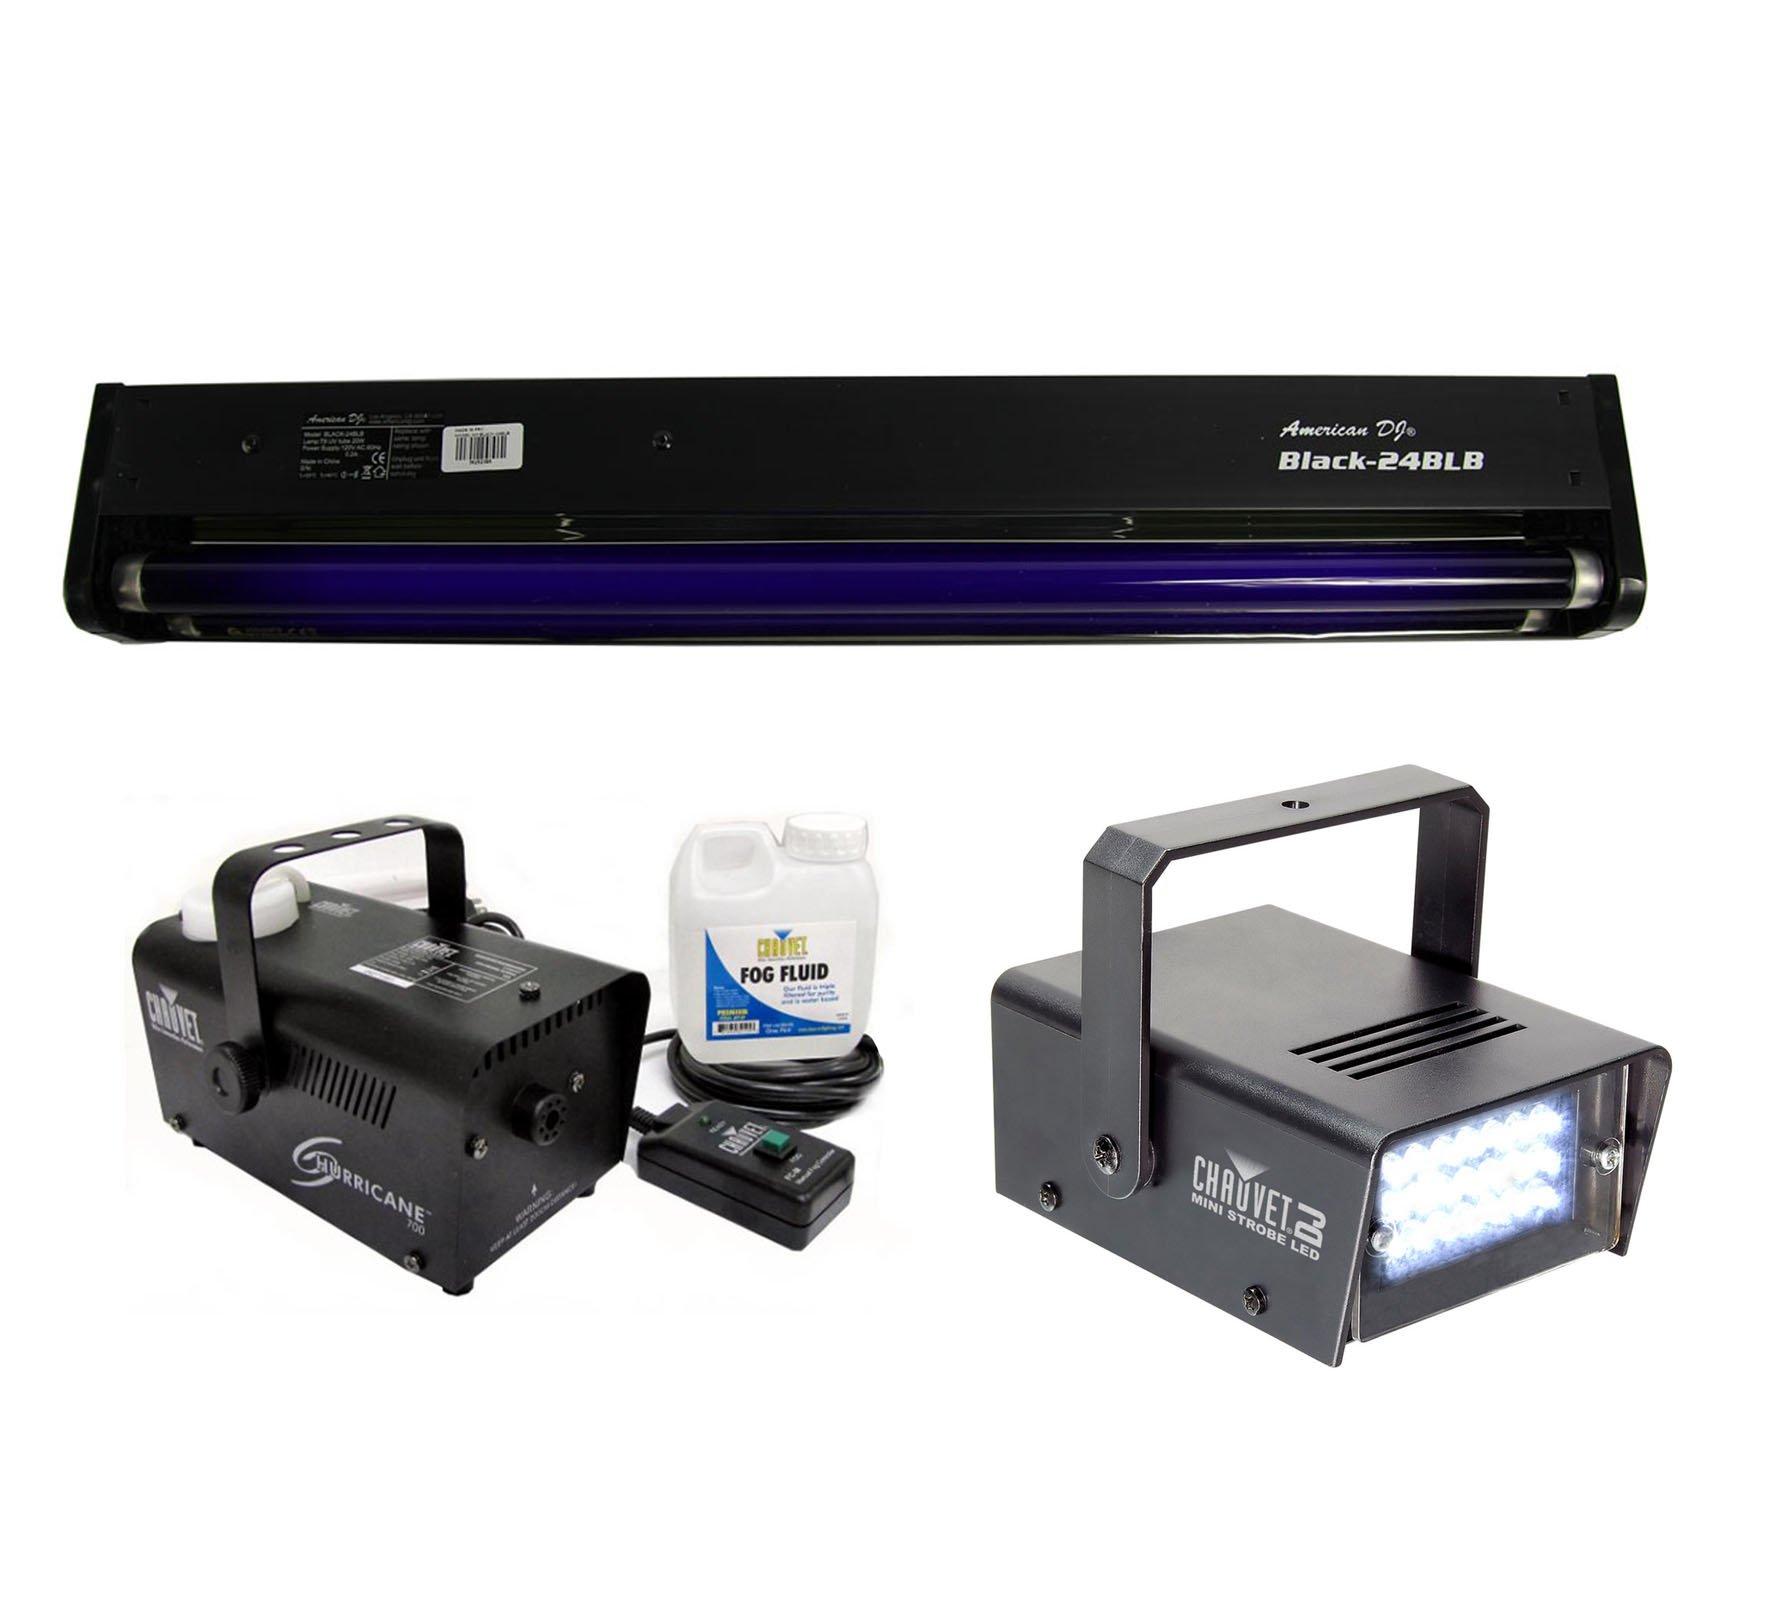 AMERICAN DJ BLACK-24BLB 24'' UV Blacklight + CHAUVET Strobe Light + Fog Machine